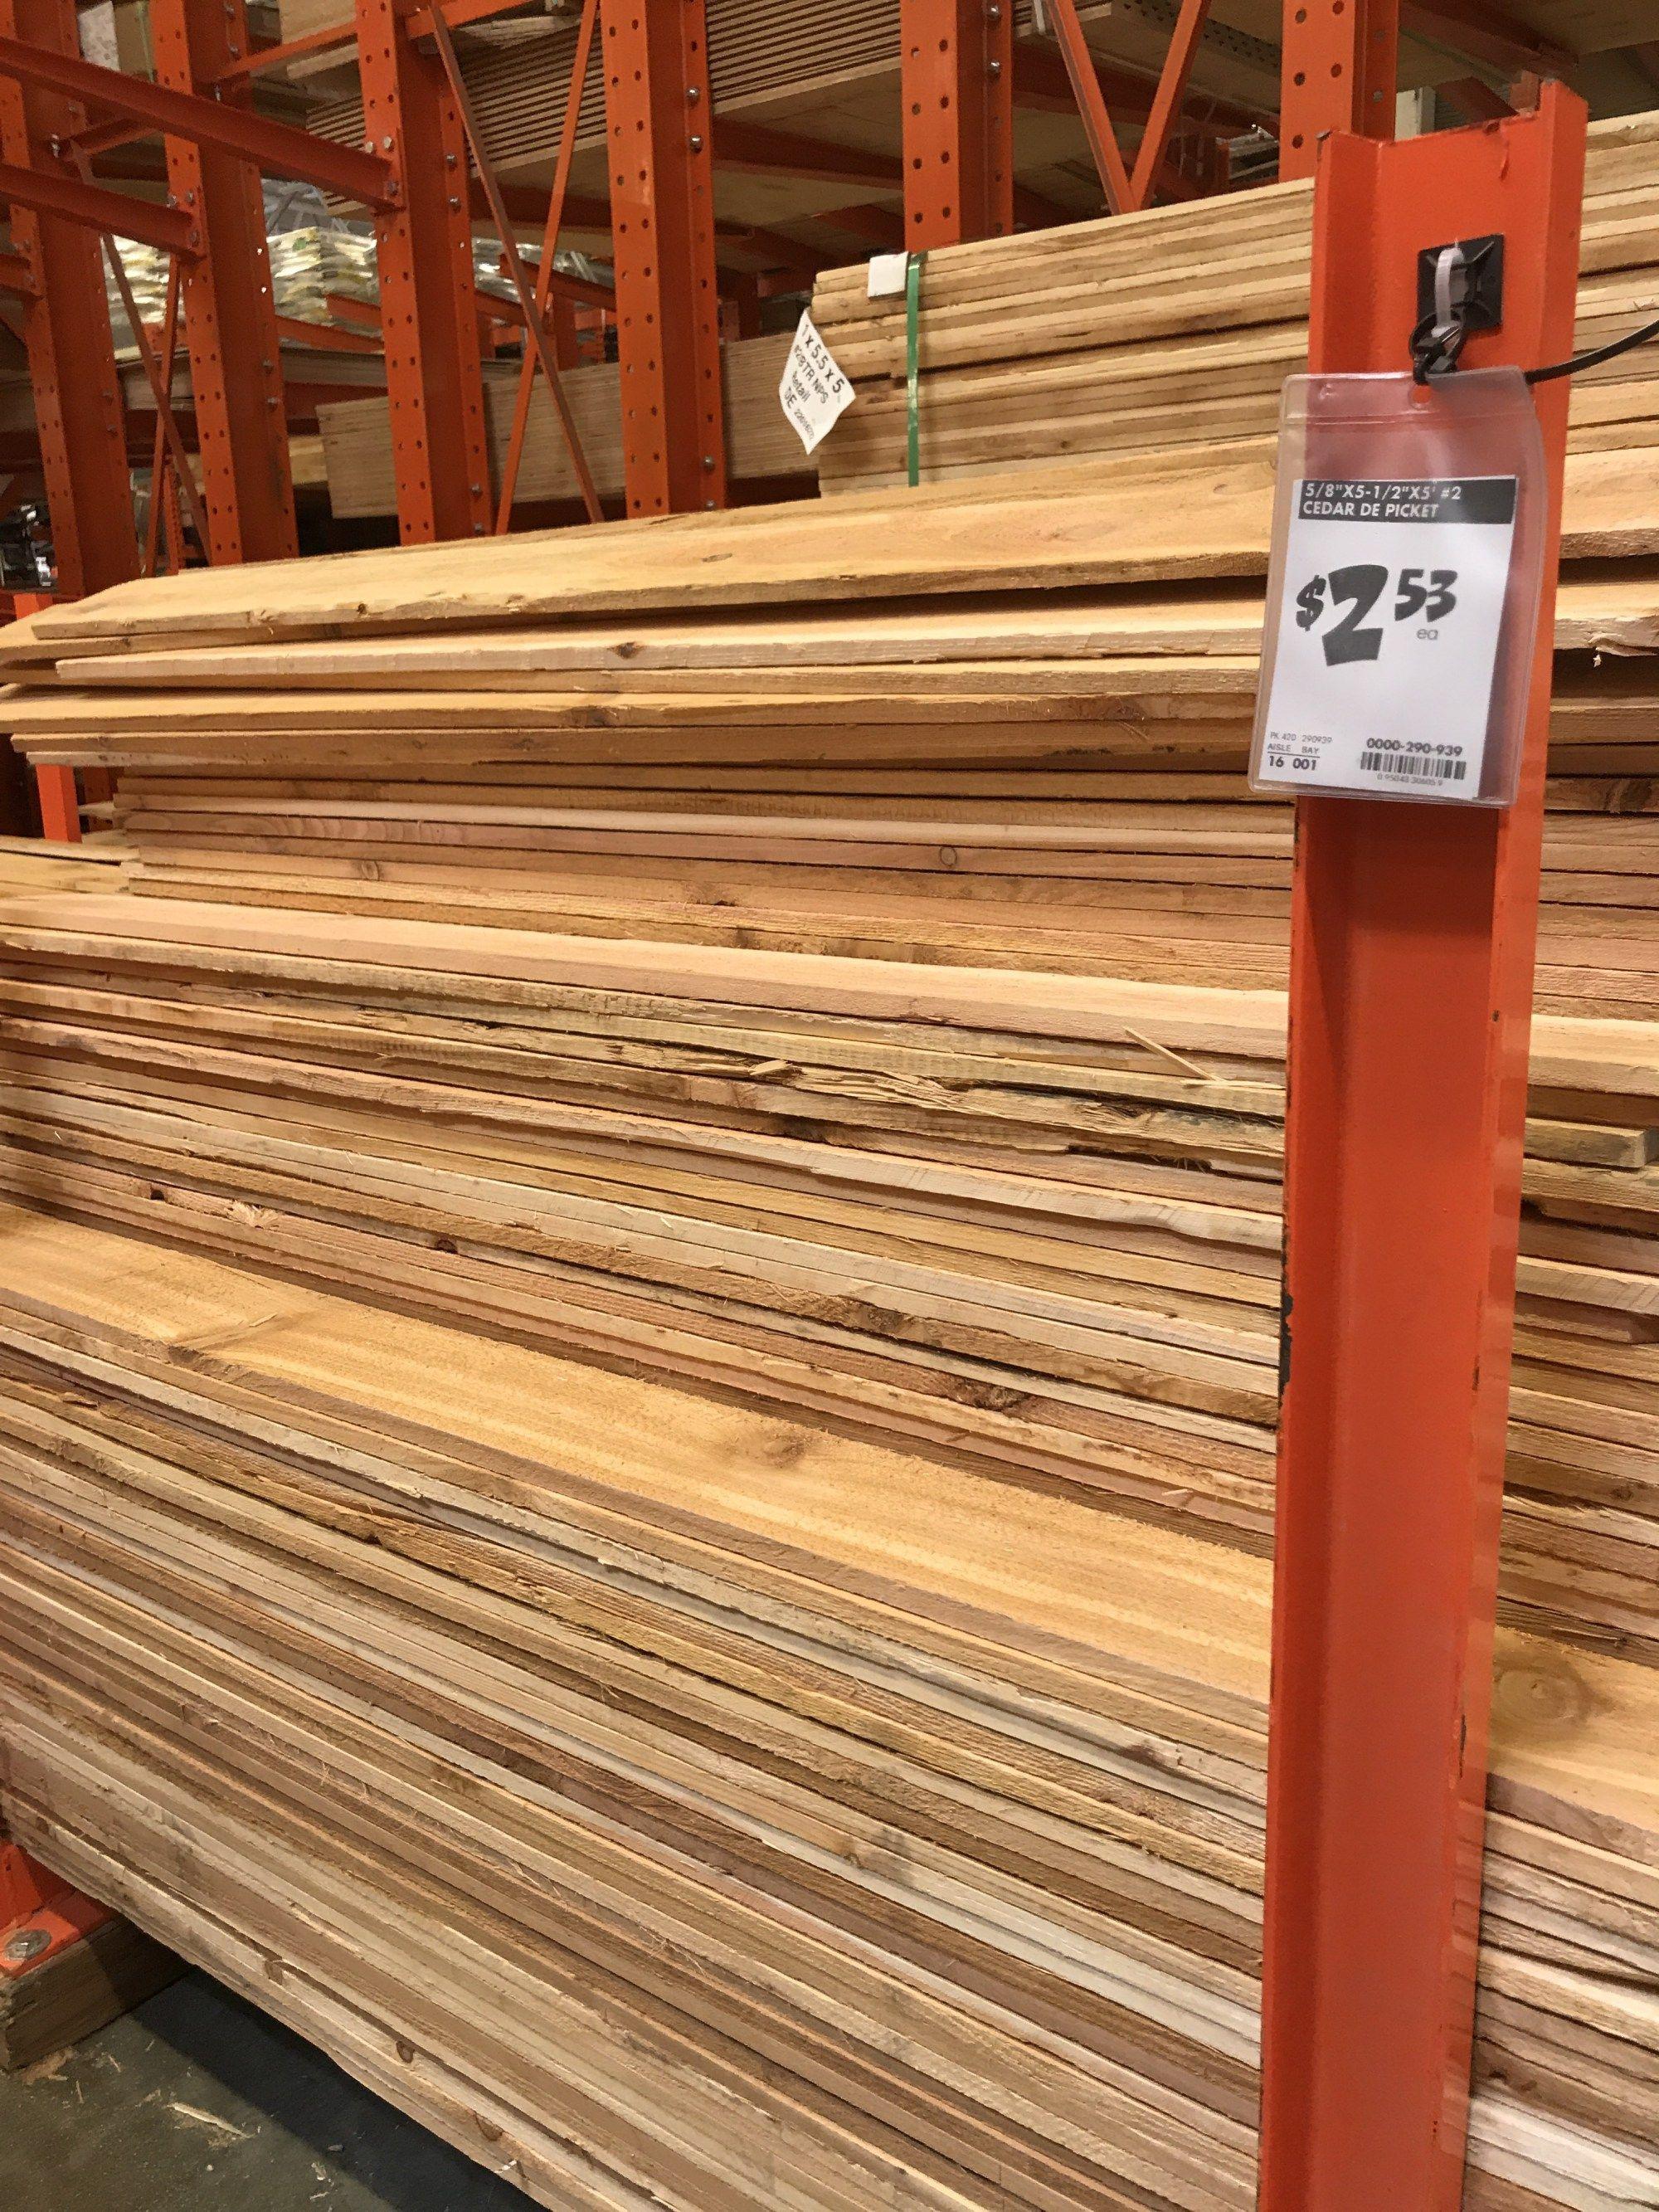 Diy wood plank wall on a budget wood plank walls plank